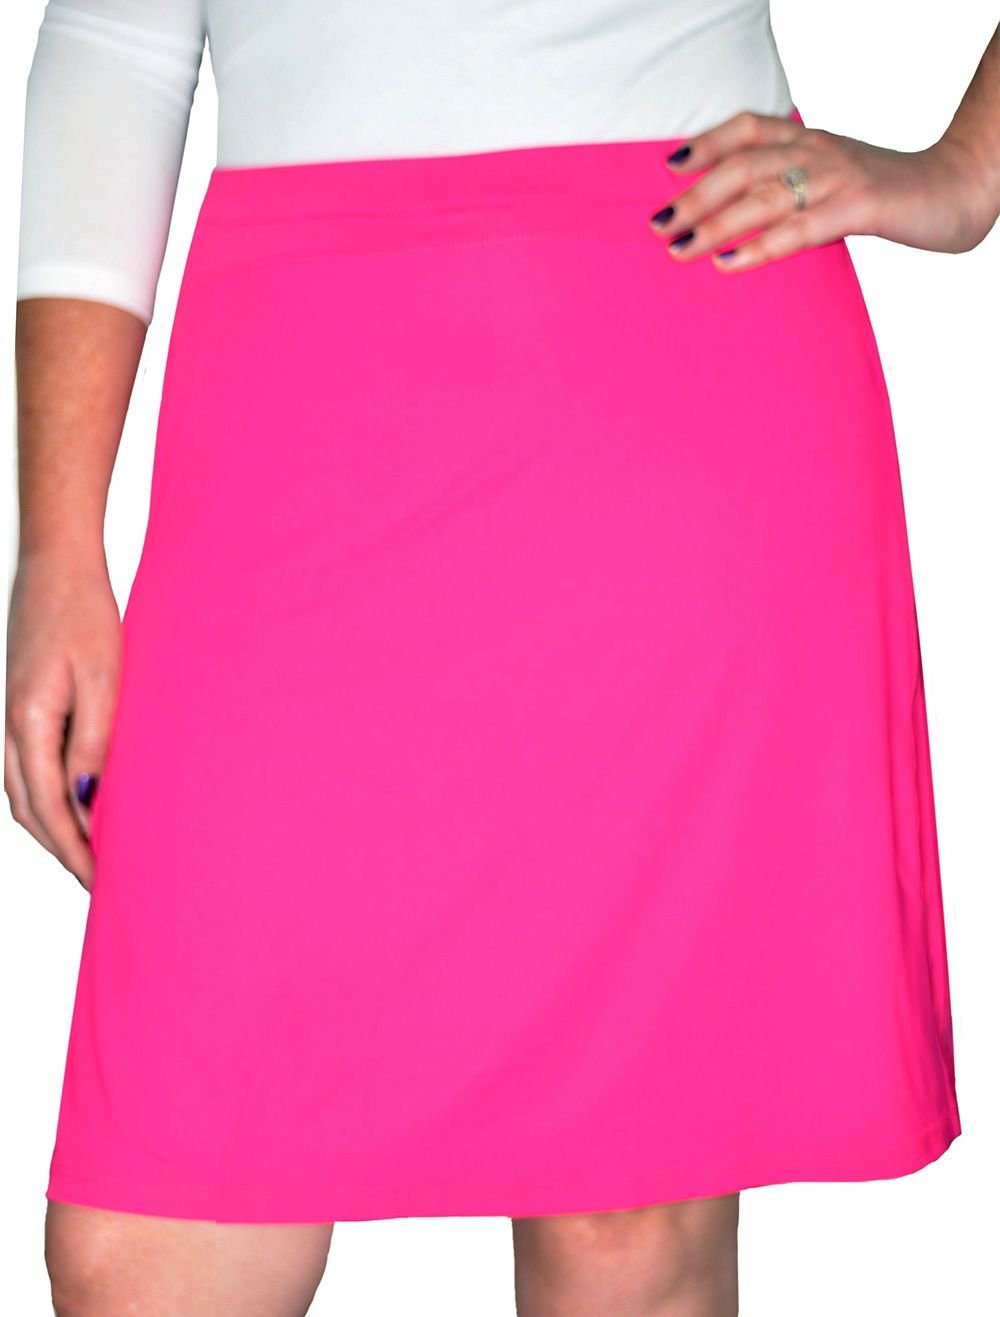 Kosher Casual Women's Modest Knee-Length Swim & Sport Skirt with Built-in Shorts - Skort Style XXL Pink